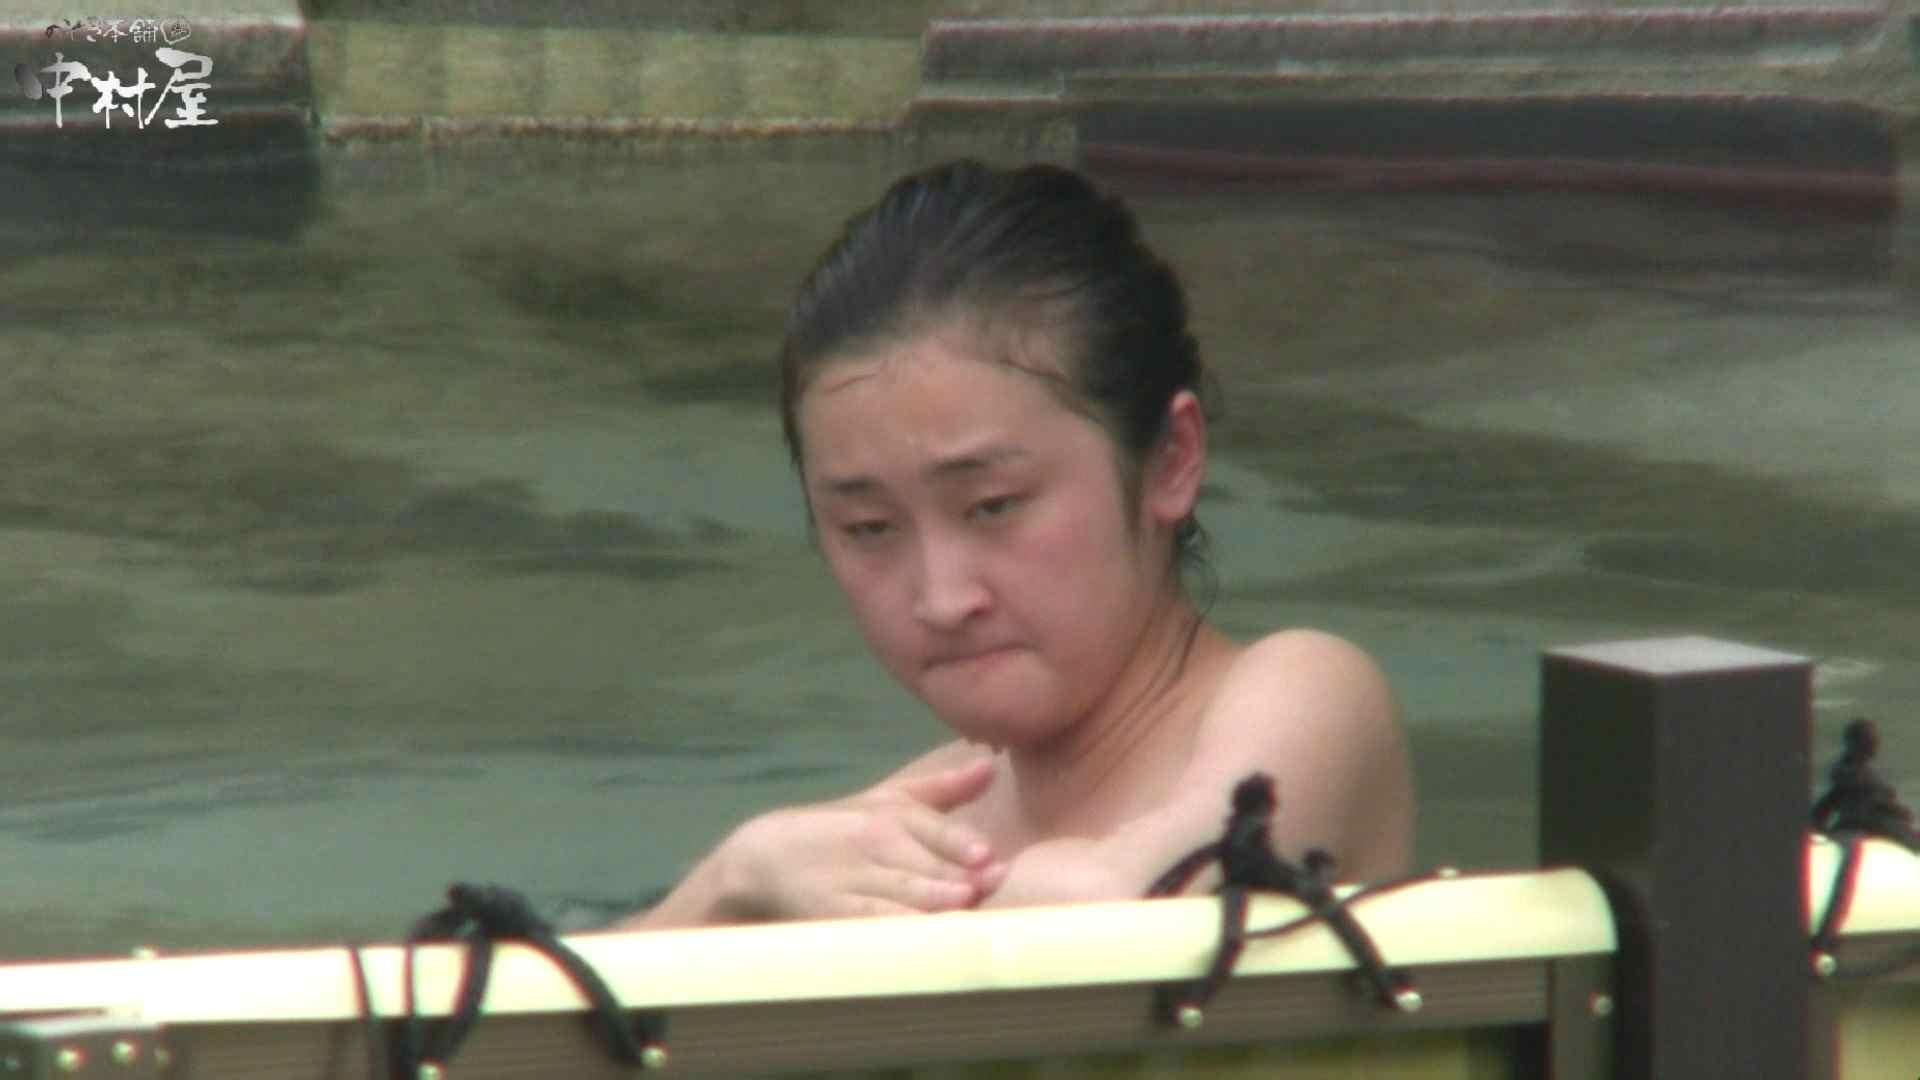 Aquaな露天風呂Vol.949 盗撮   OLセックス  92画像 55